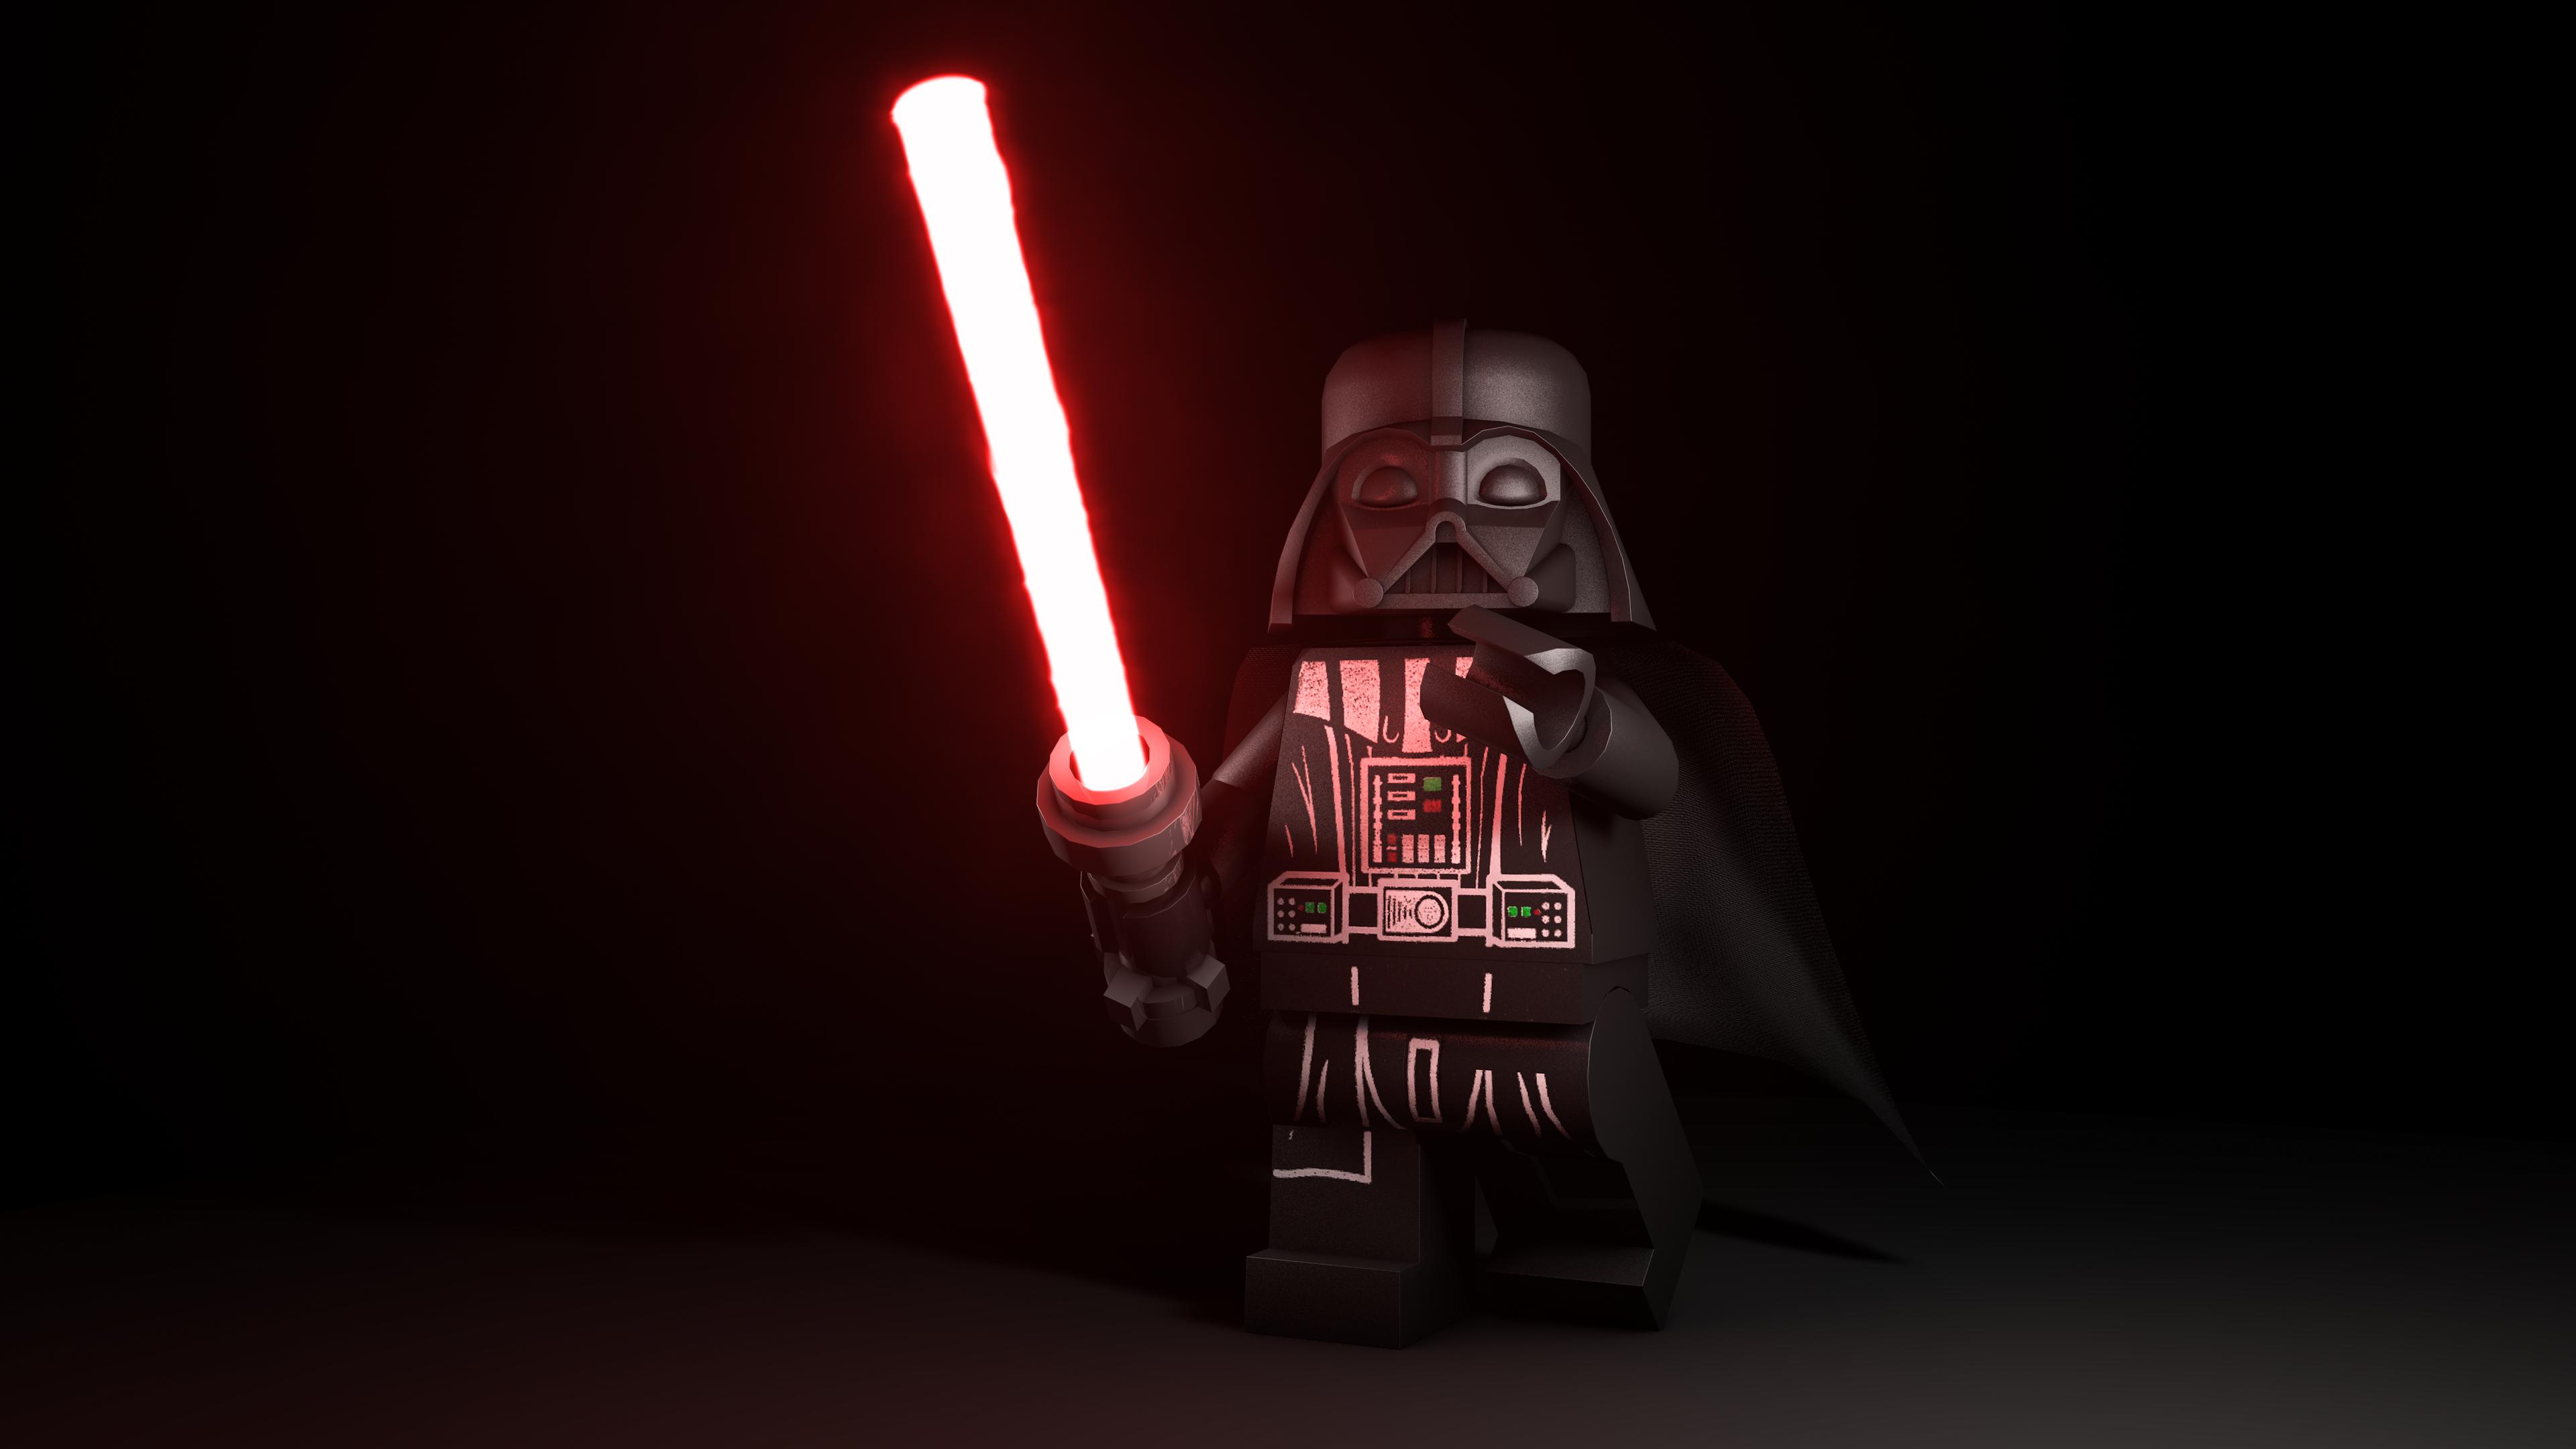 General 3840x2160 Star Wars LEGO Star Wars Darth Vader Sith simple background lightsaber LEGO digital art toys